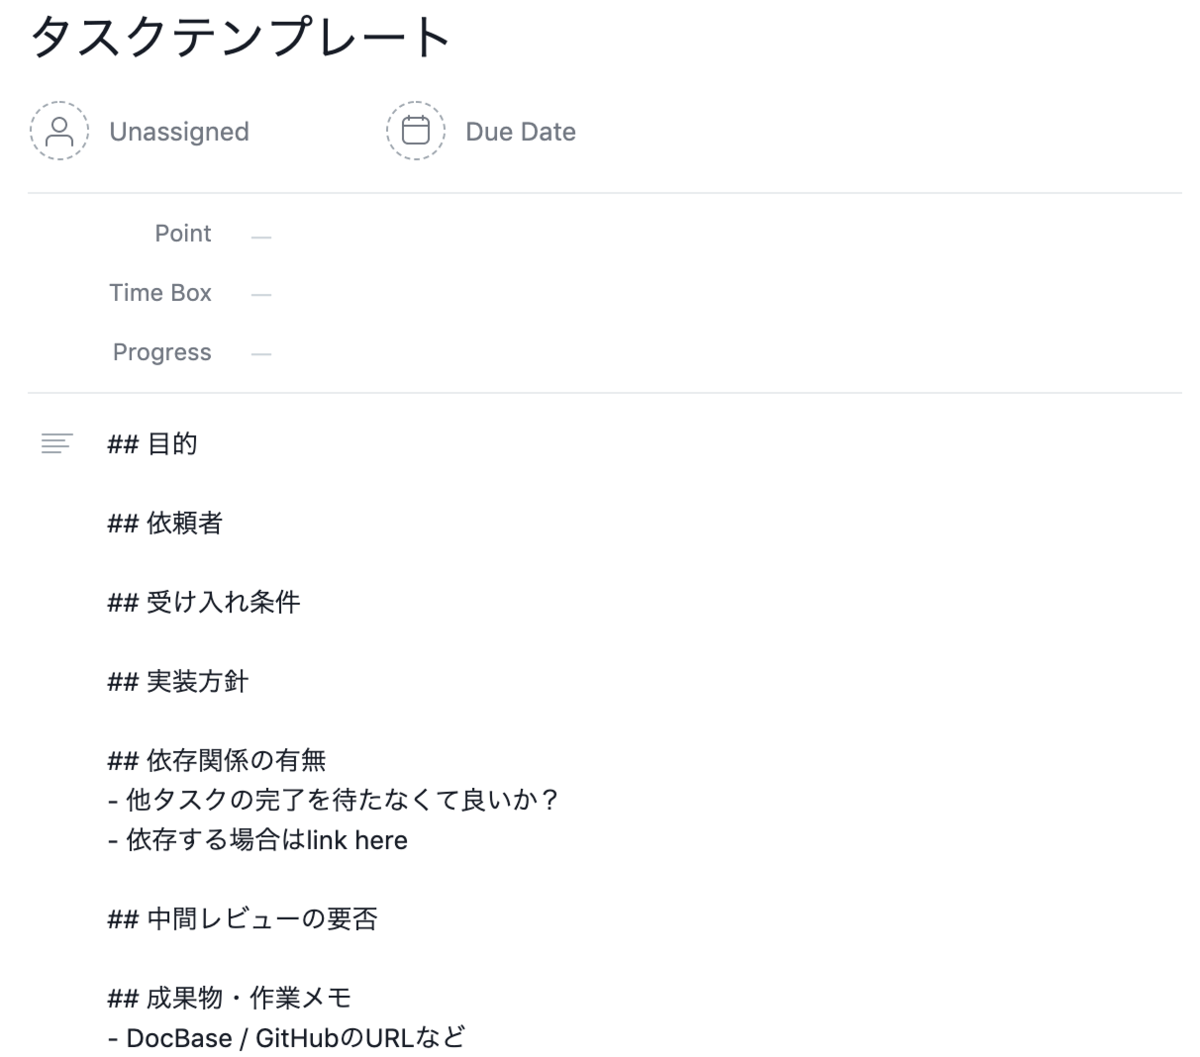 f:id:yuma124:20191204153641p:plain